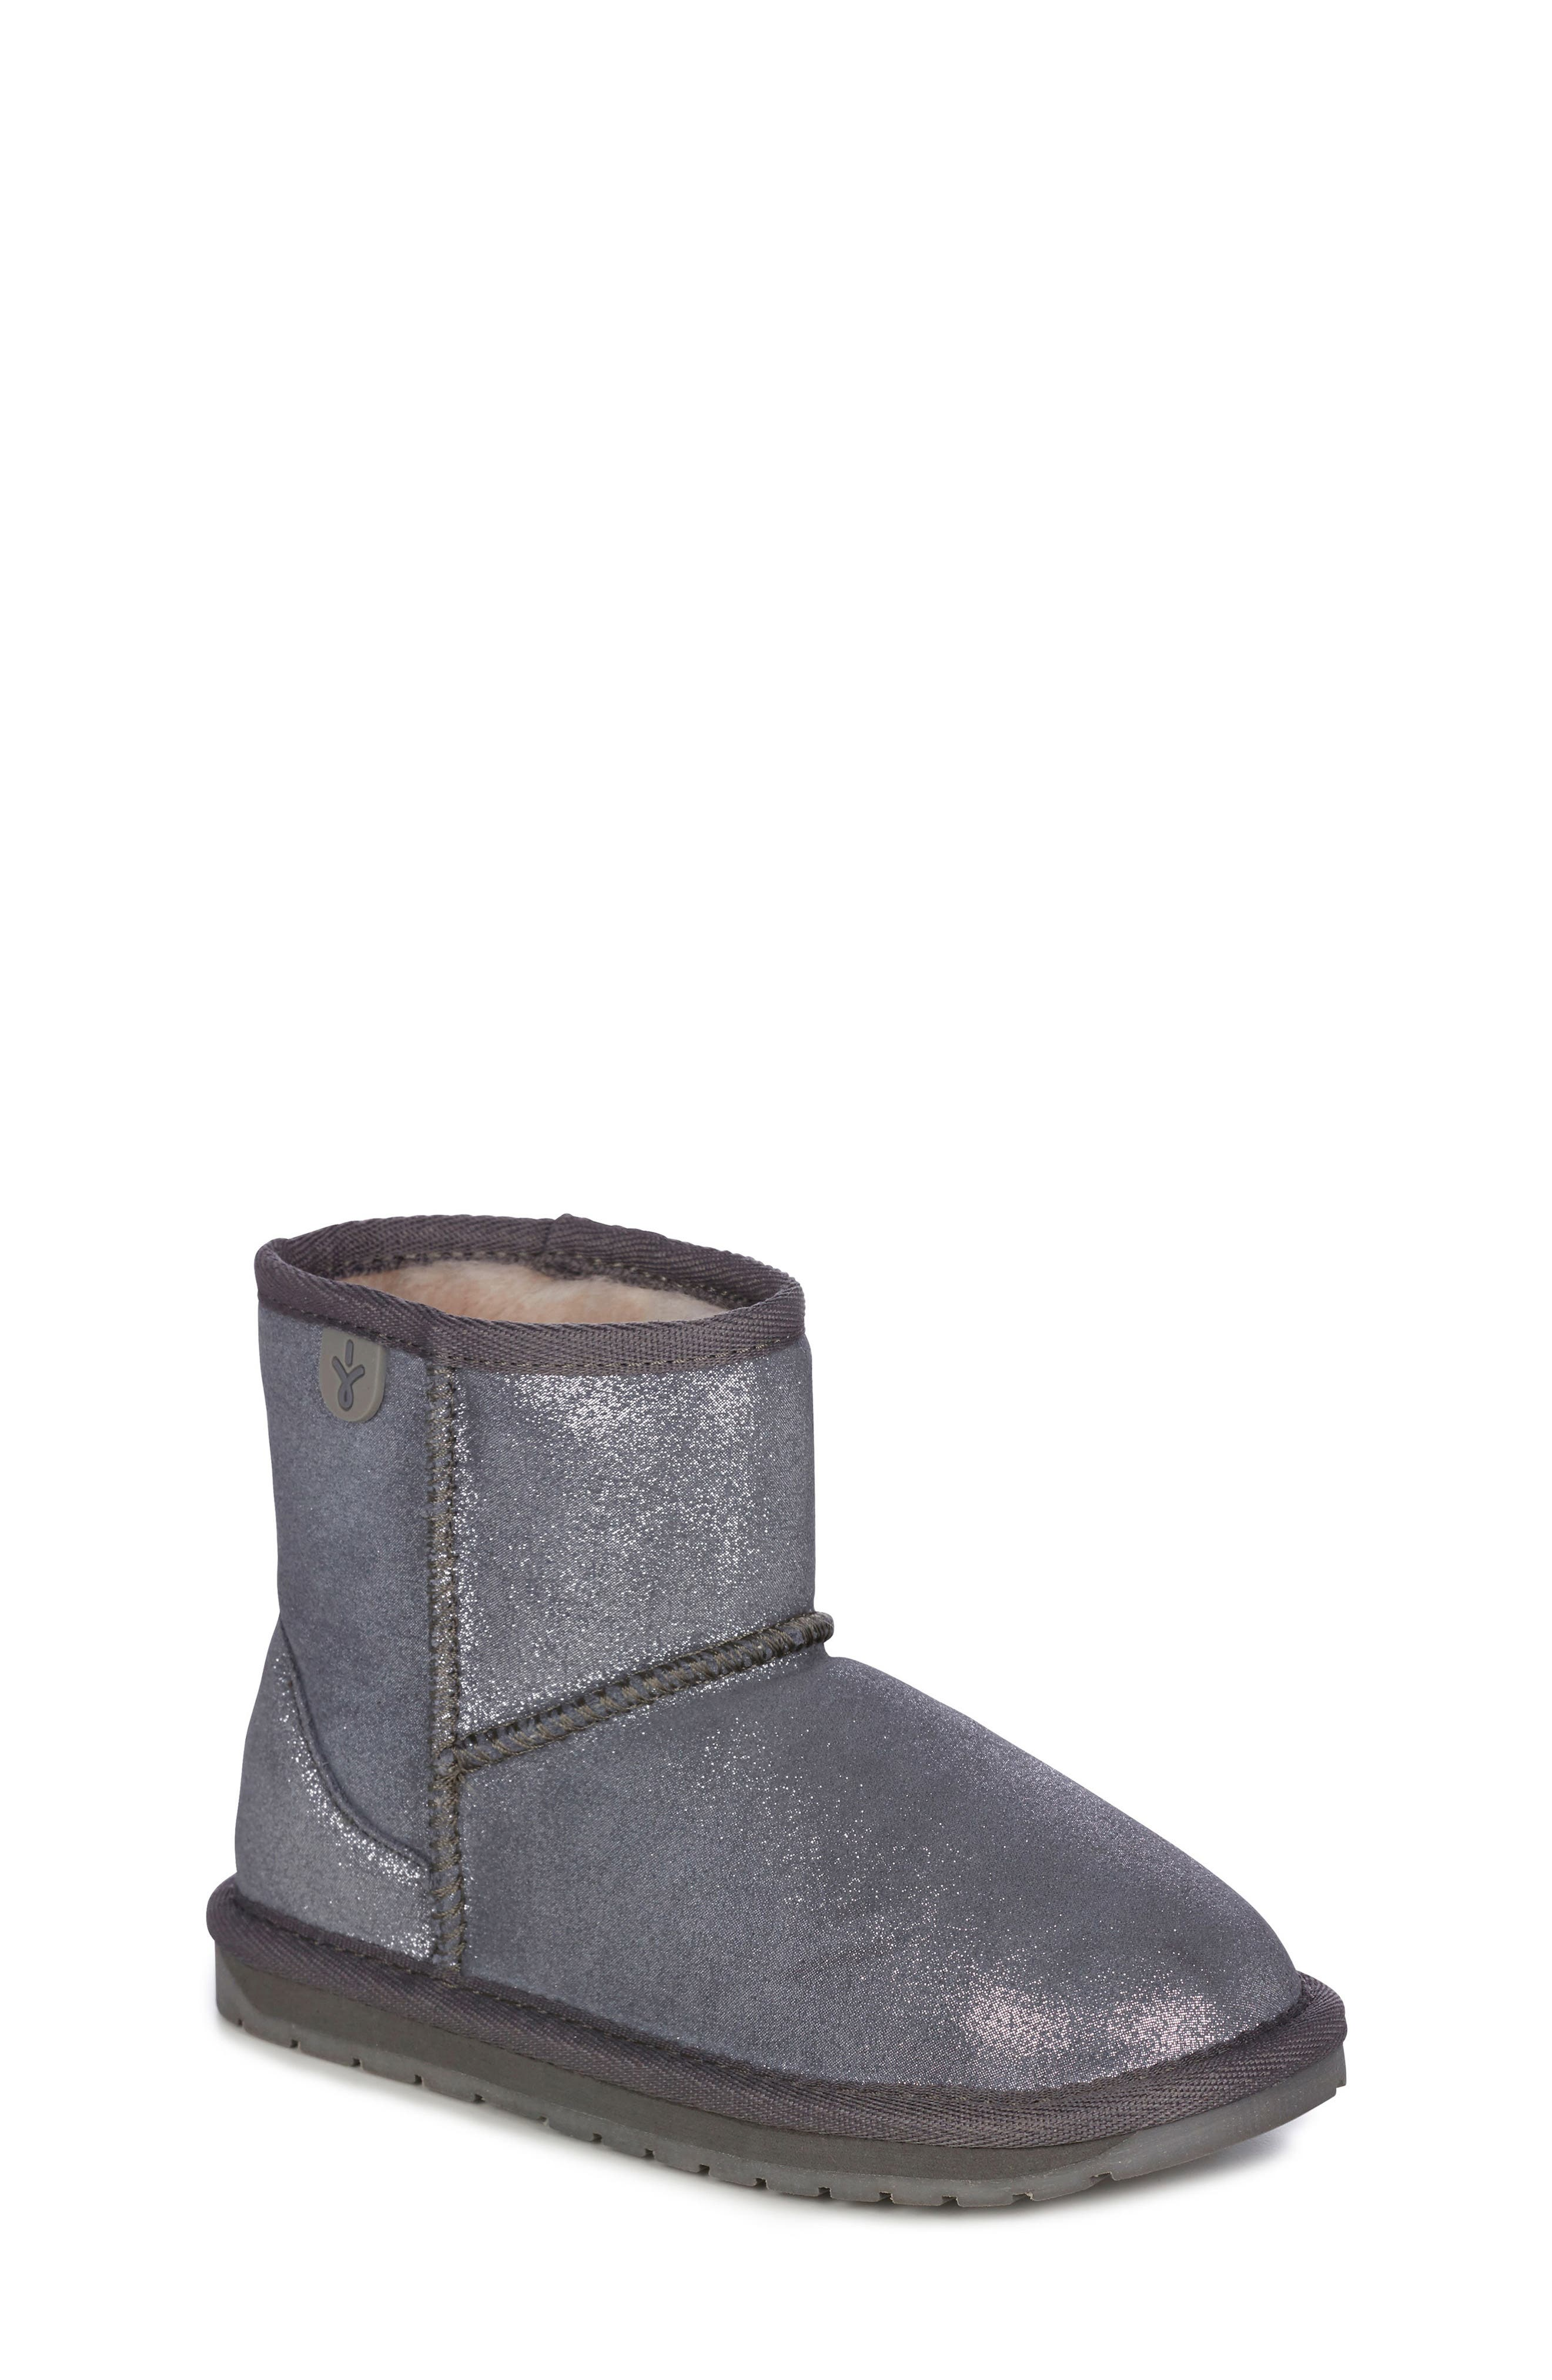 Wallaby Boot,                         Main,                         color, METALLIC CHARCOAL